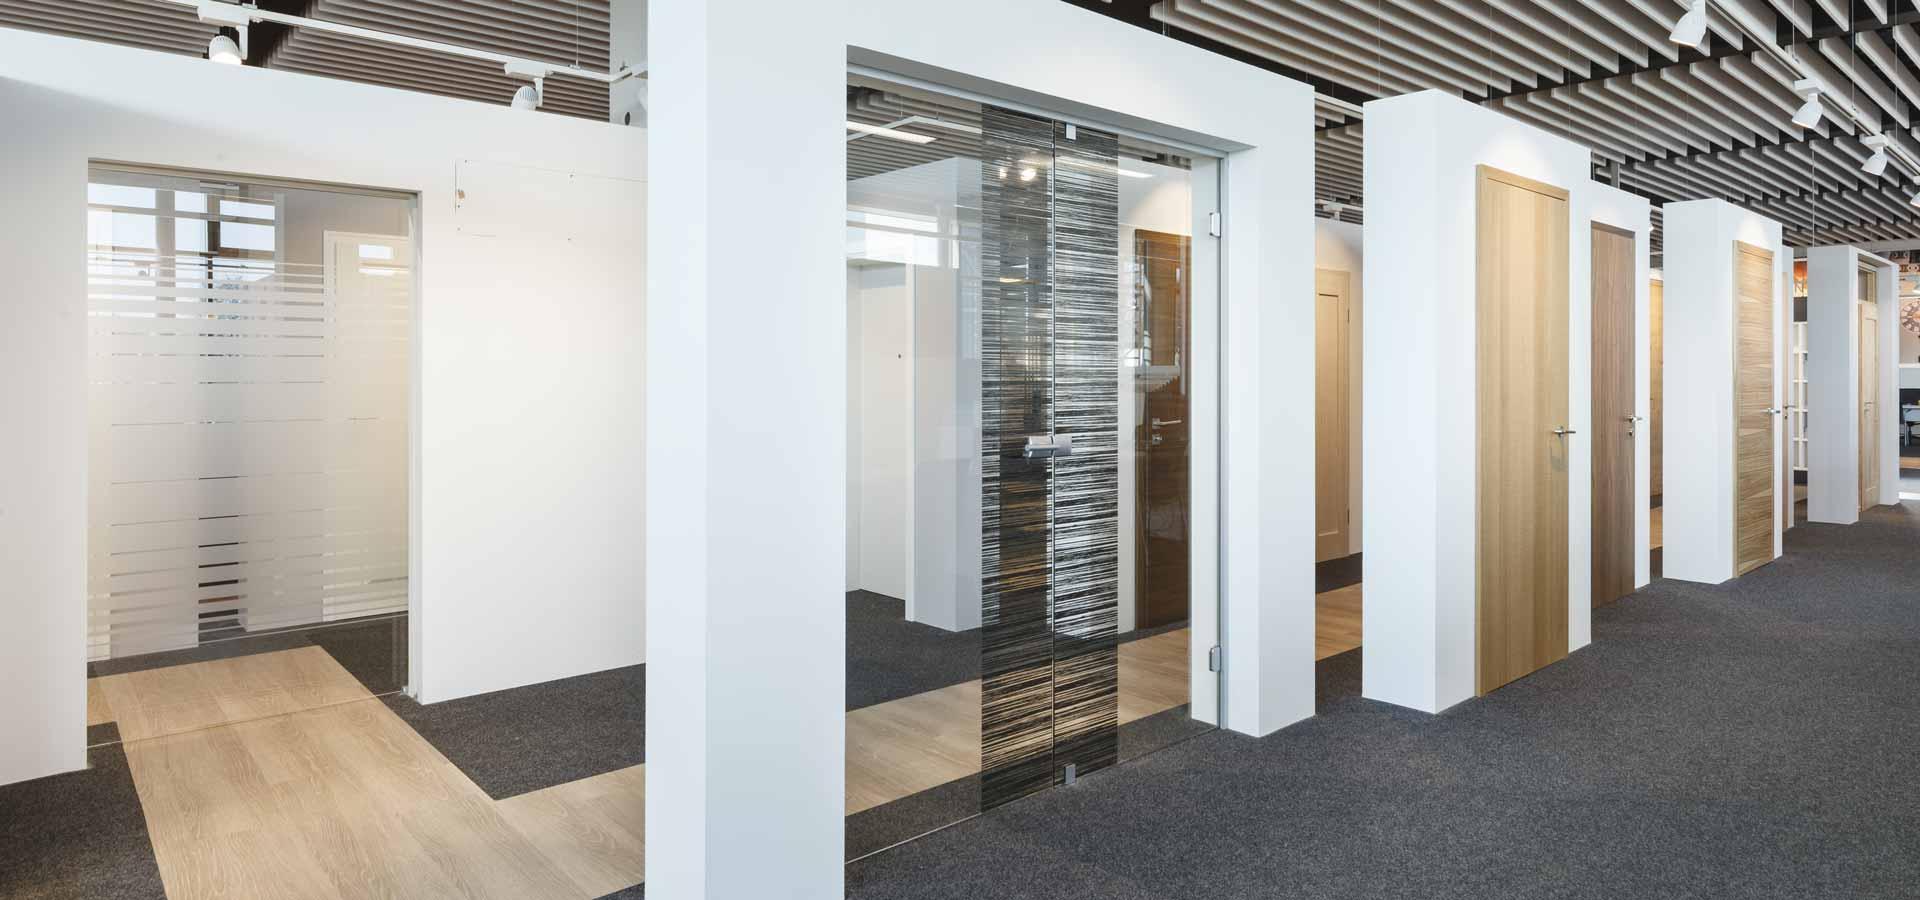 OPUS Marketing / Baustoffhandel / Ausstellung / Planung / Konzeption / Innenausbau